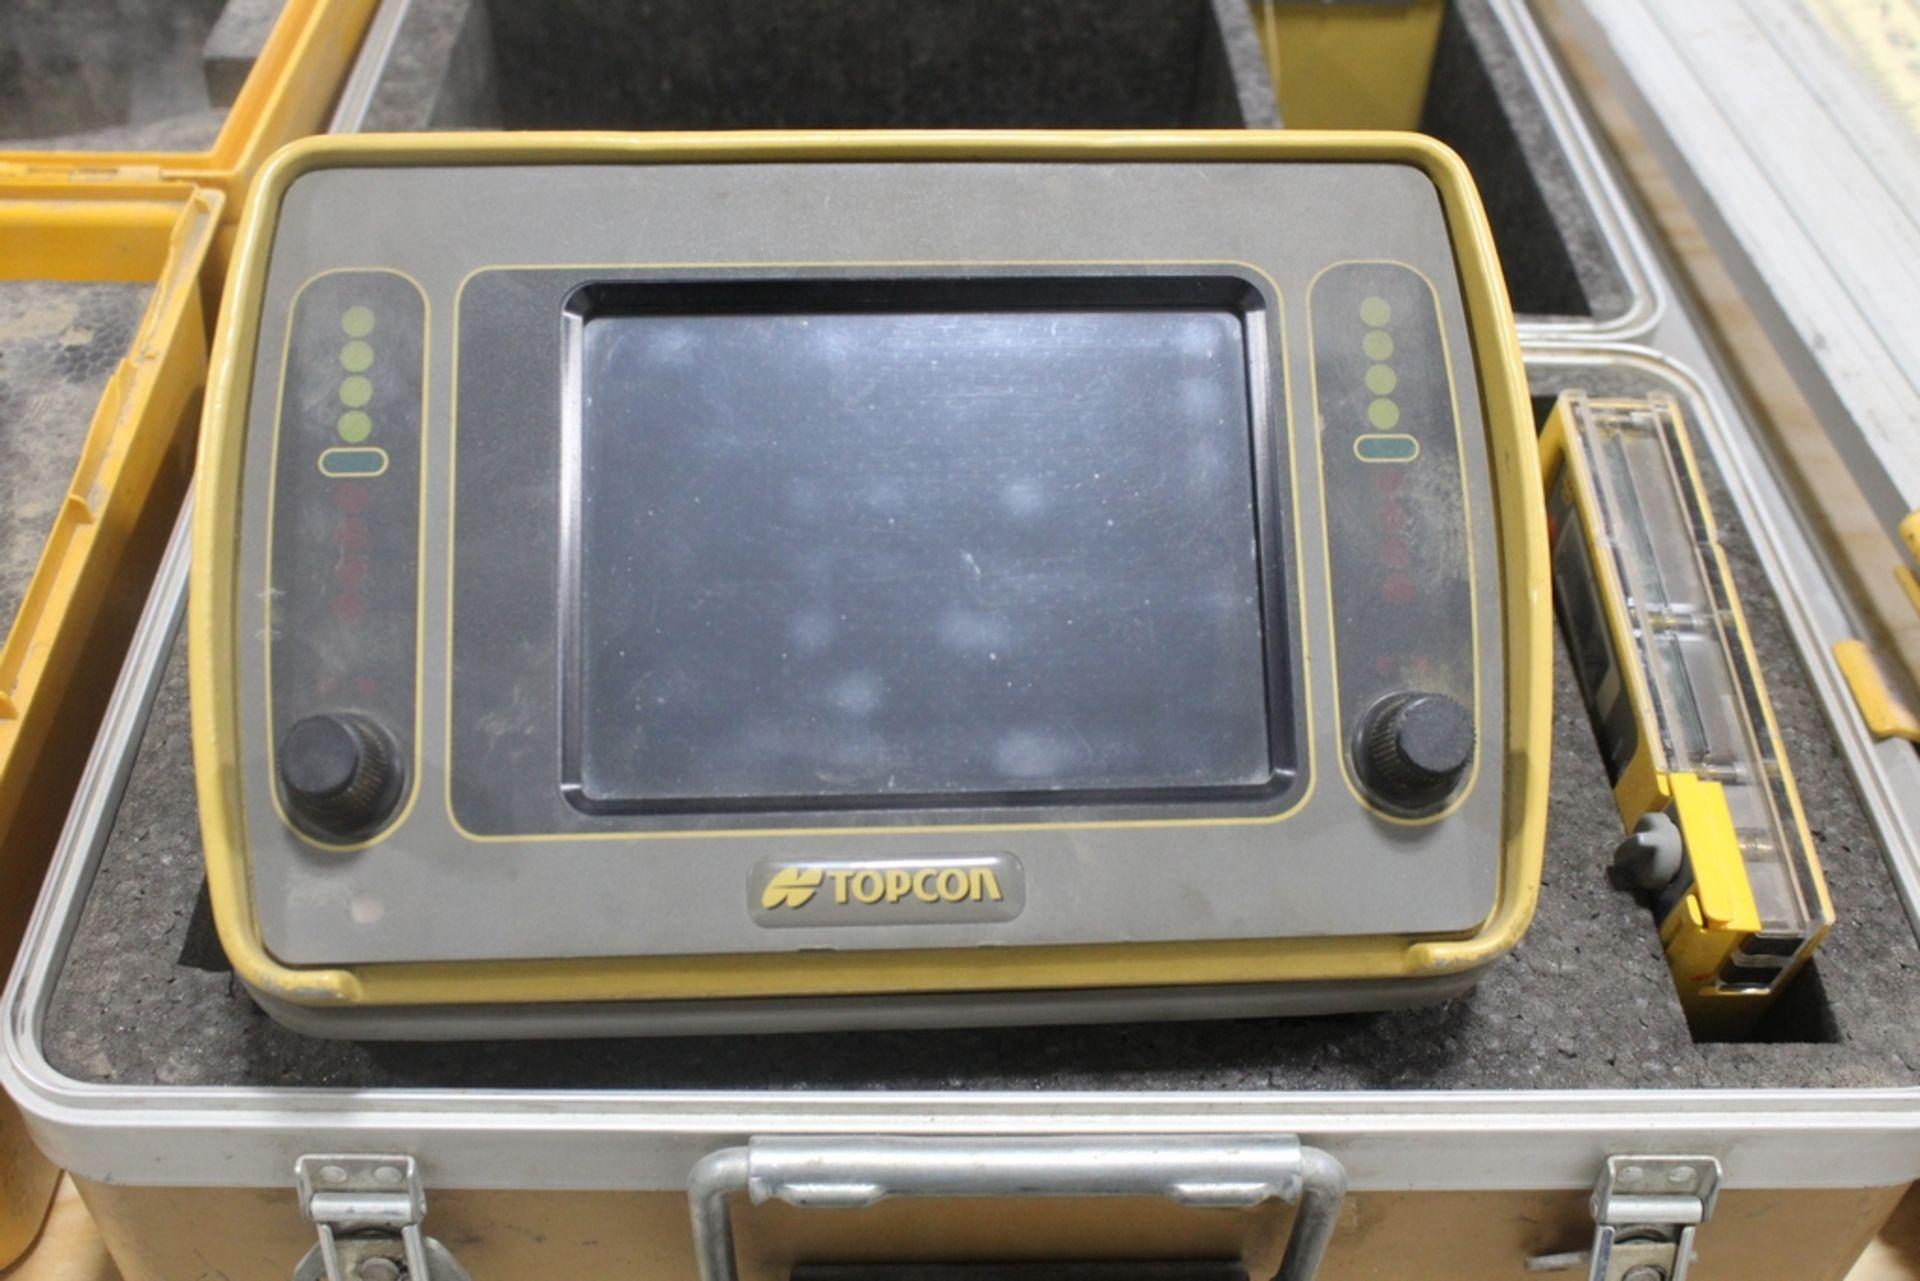 TOPCON 9168 CONTROL BOX FOR 3DMC SERIES GRADE CONTROL SYSTEM - Image 2 of 2